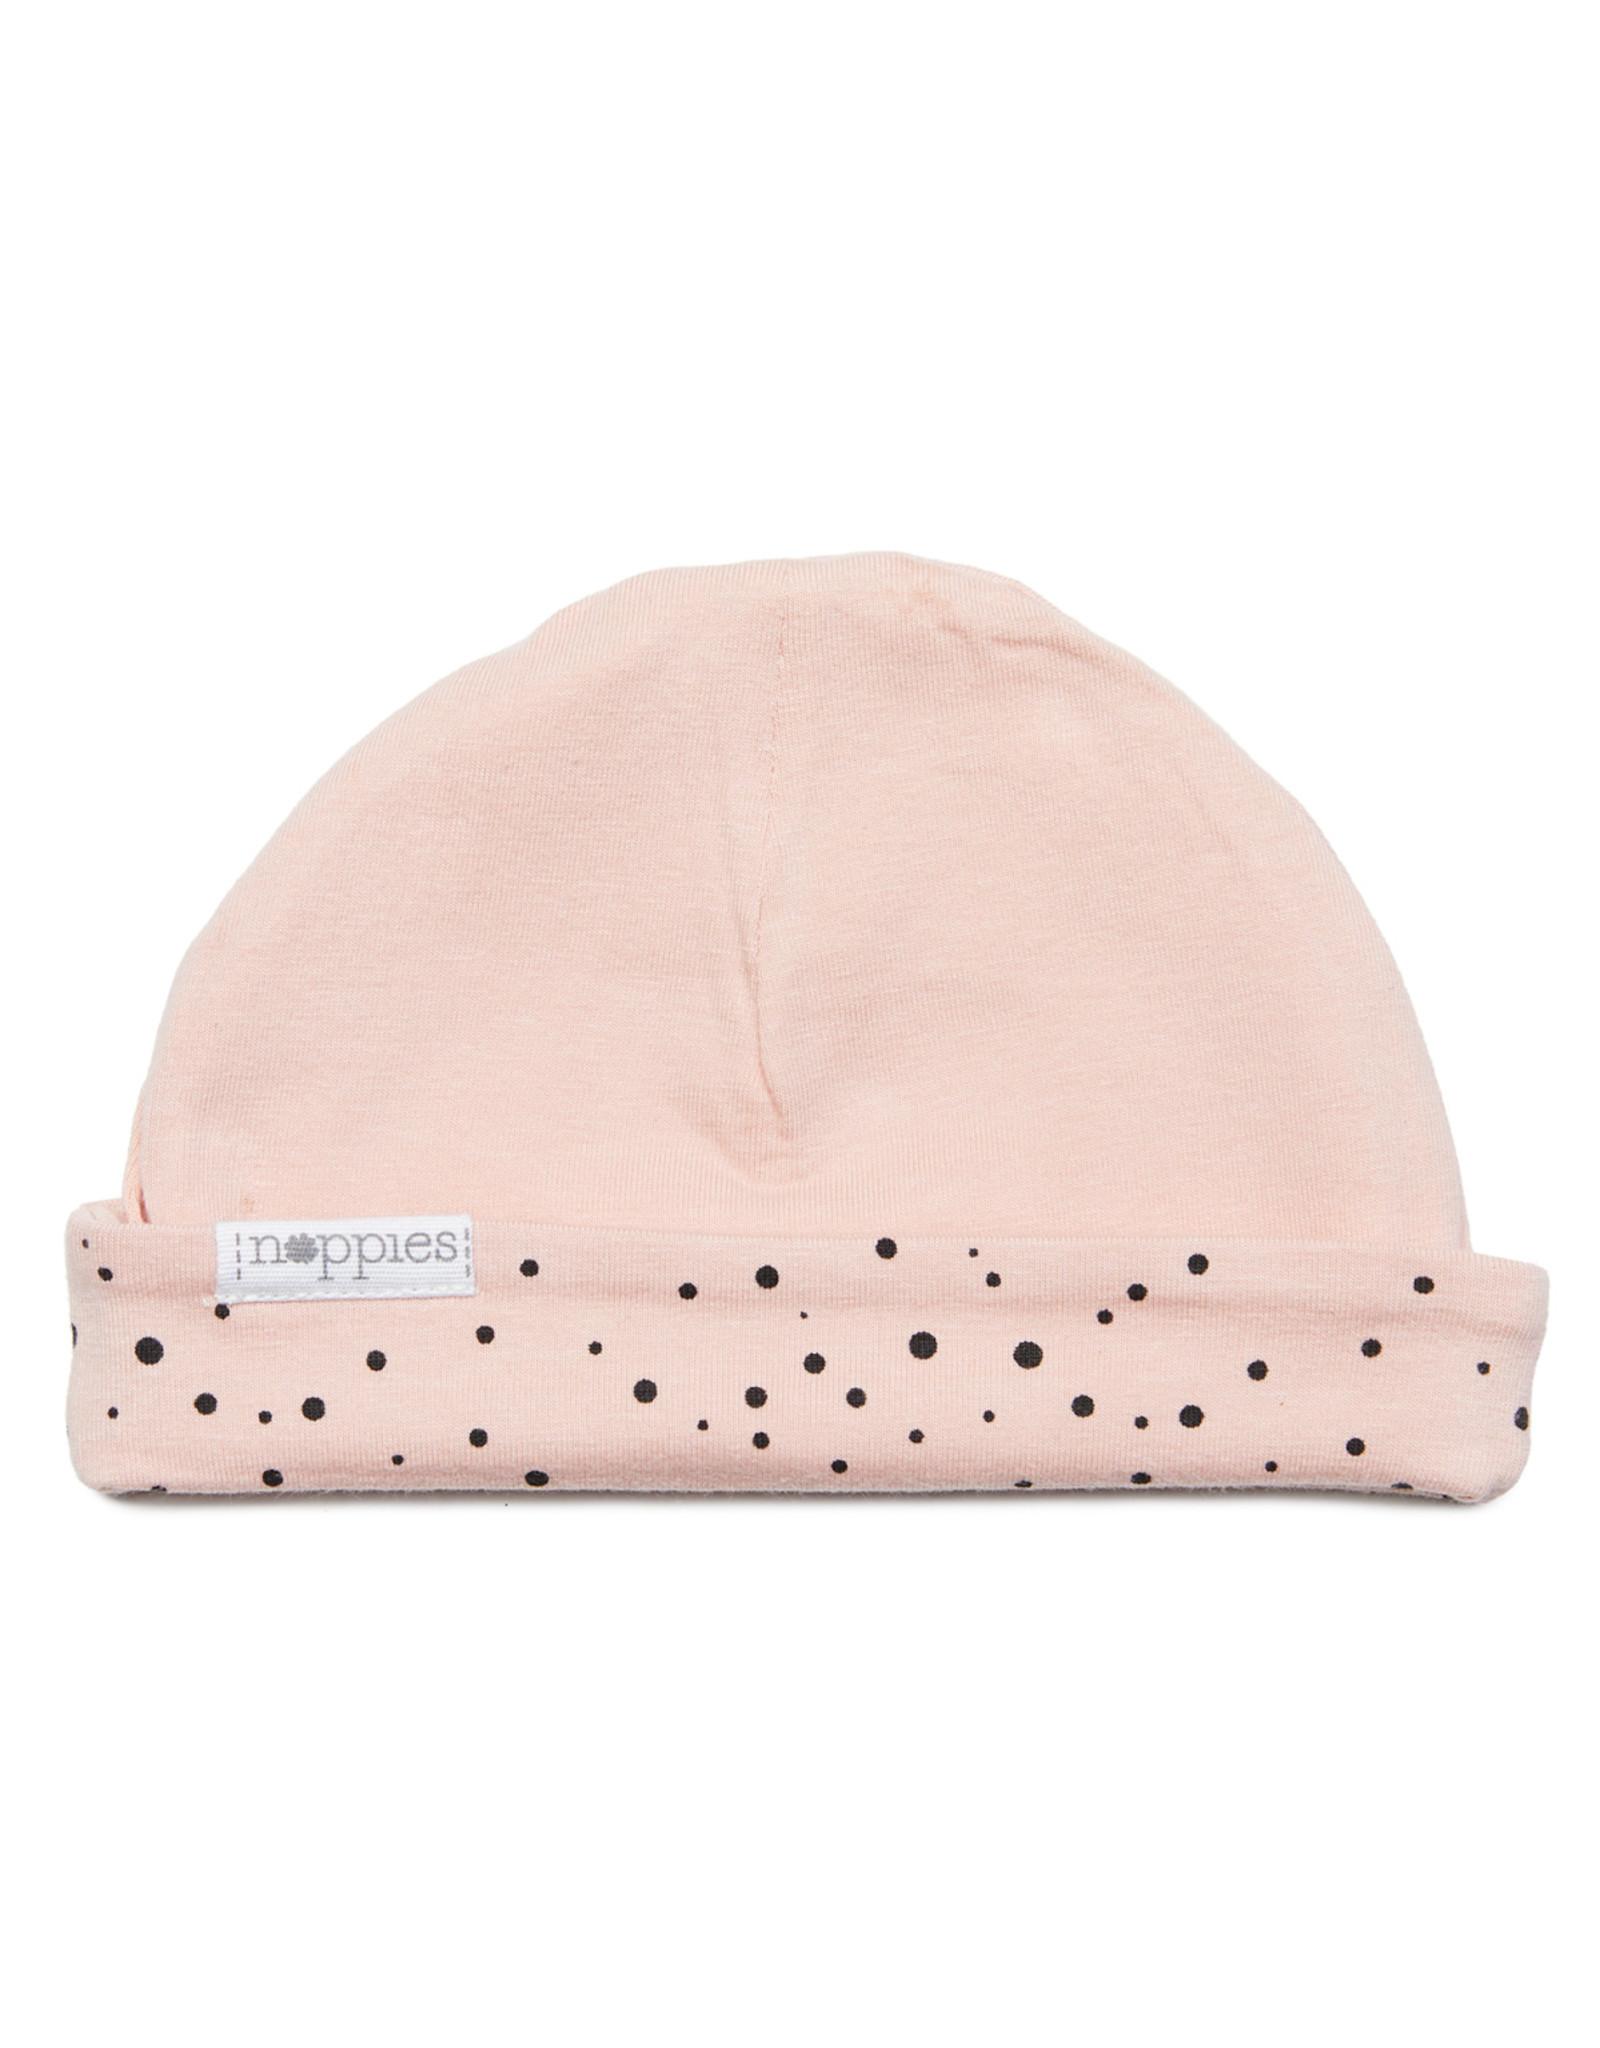 Noppies G Hat REV Lynn peach skin